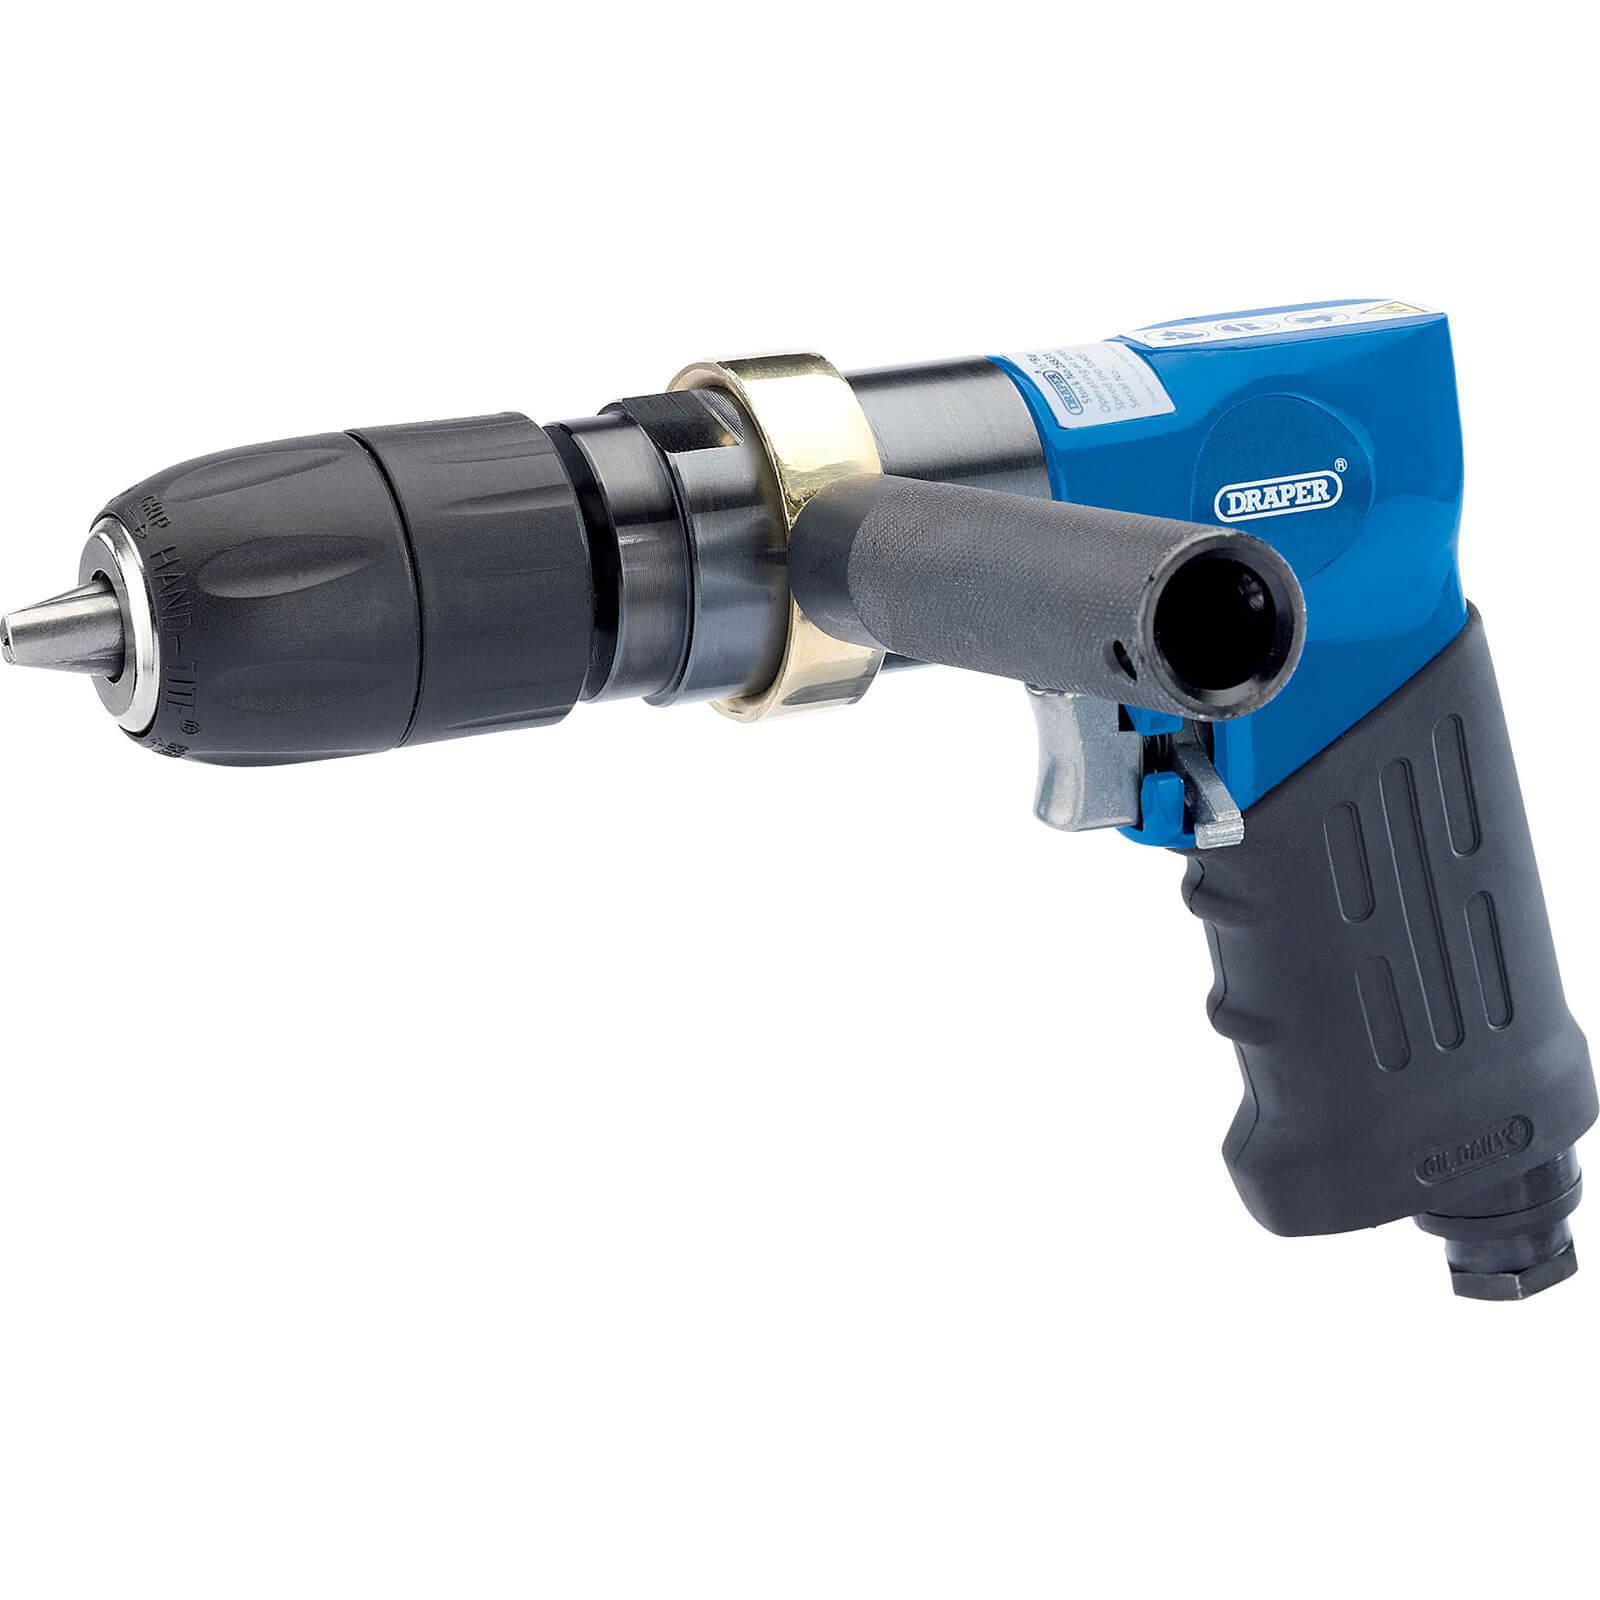 Image of Draper 4274KA Air Drill 13mm Keyless Chuck